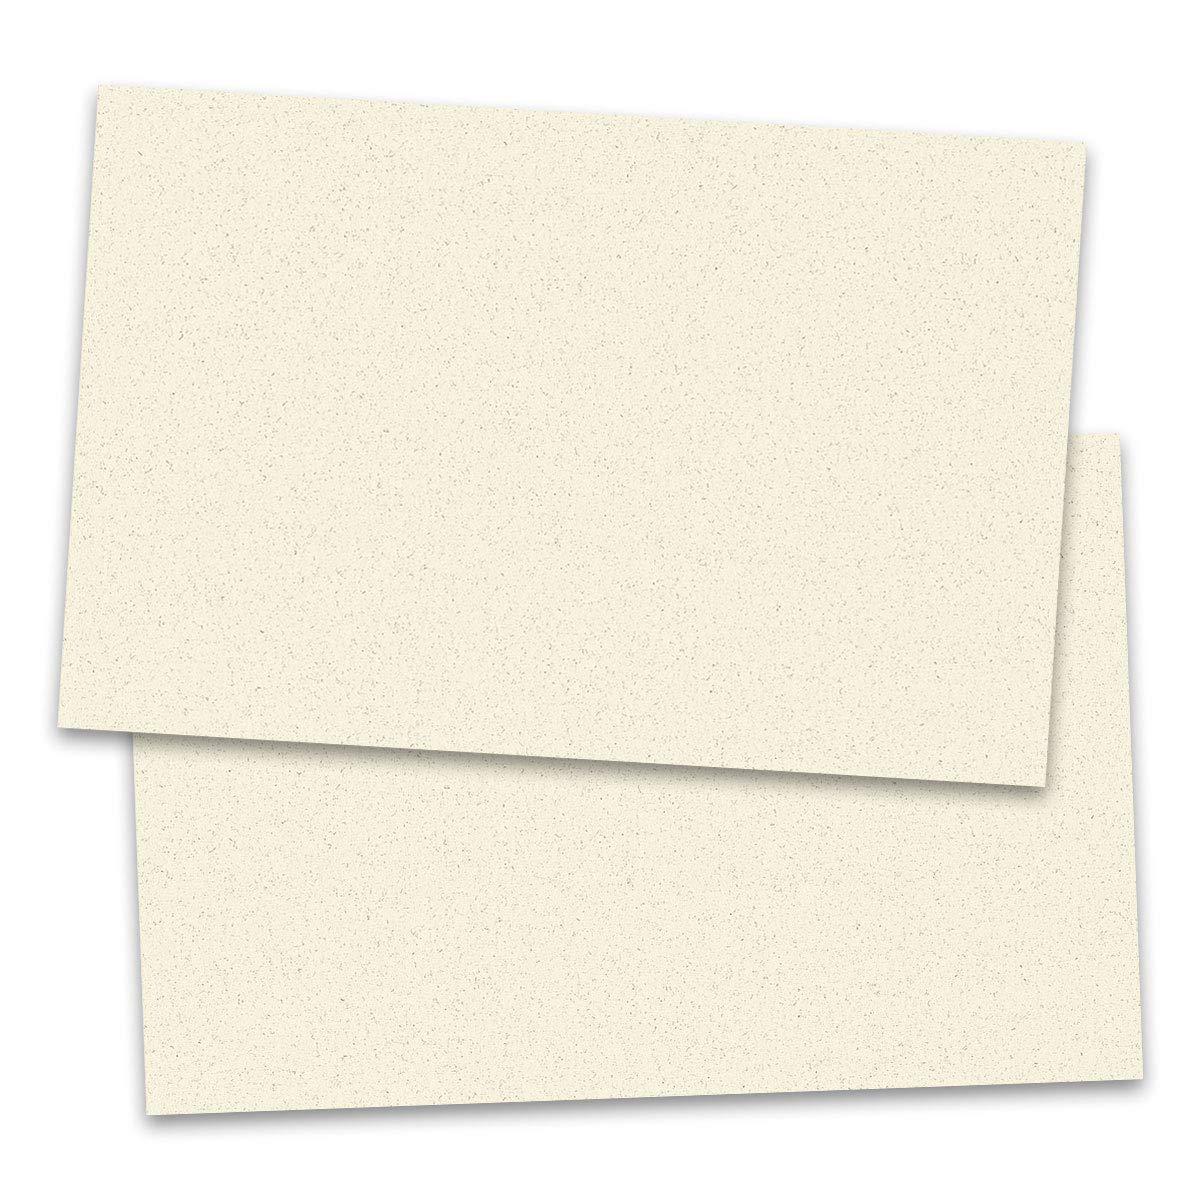 Almond Cream Perfectly Plain Postcards, Jumbo Size, 100 Count